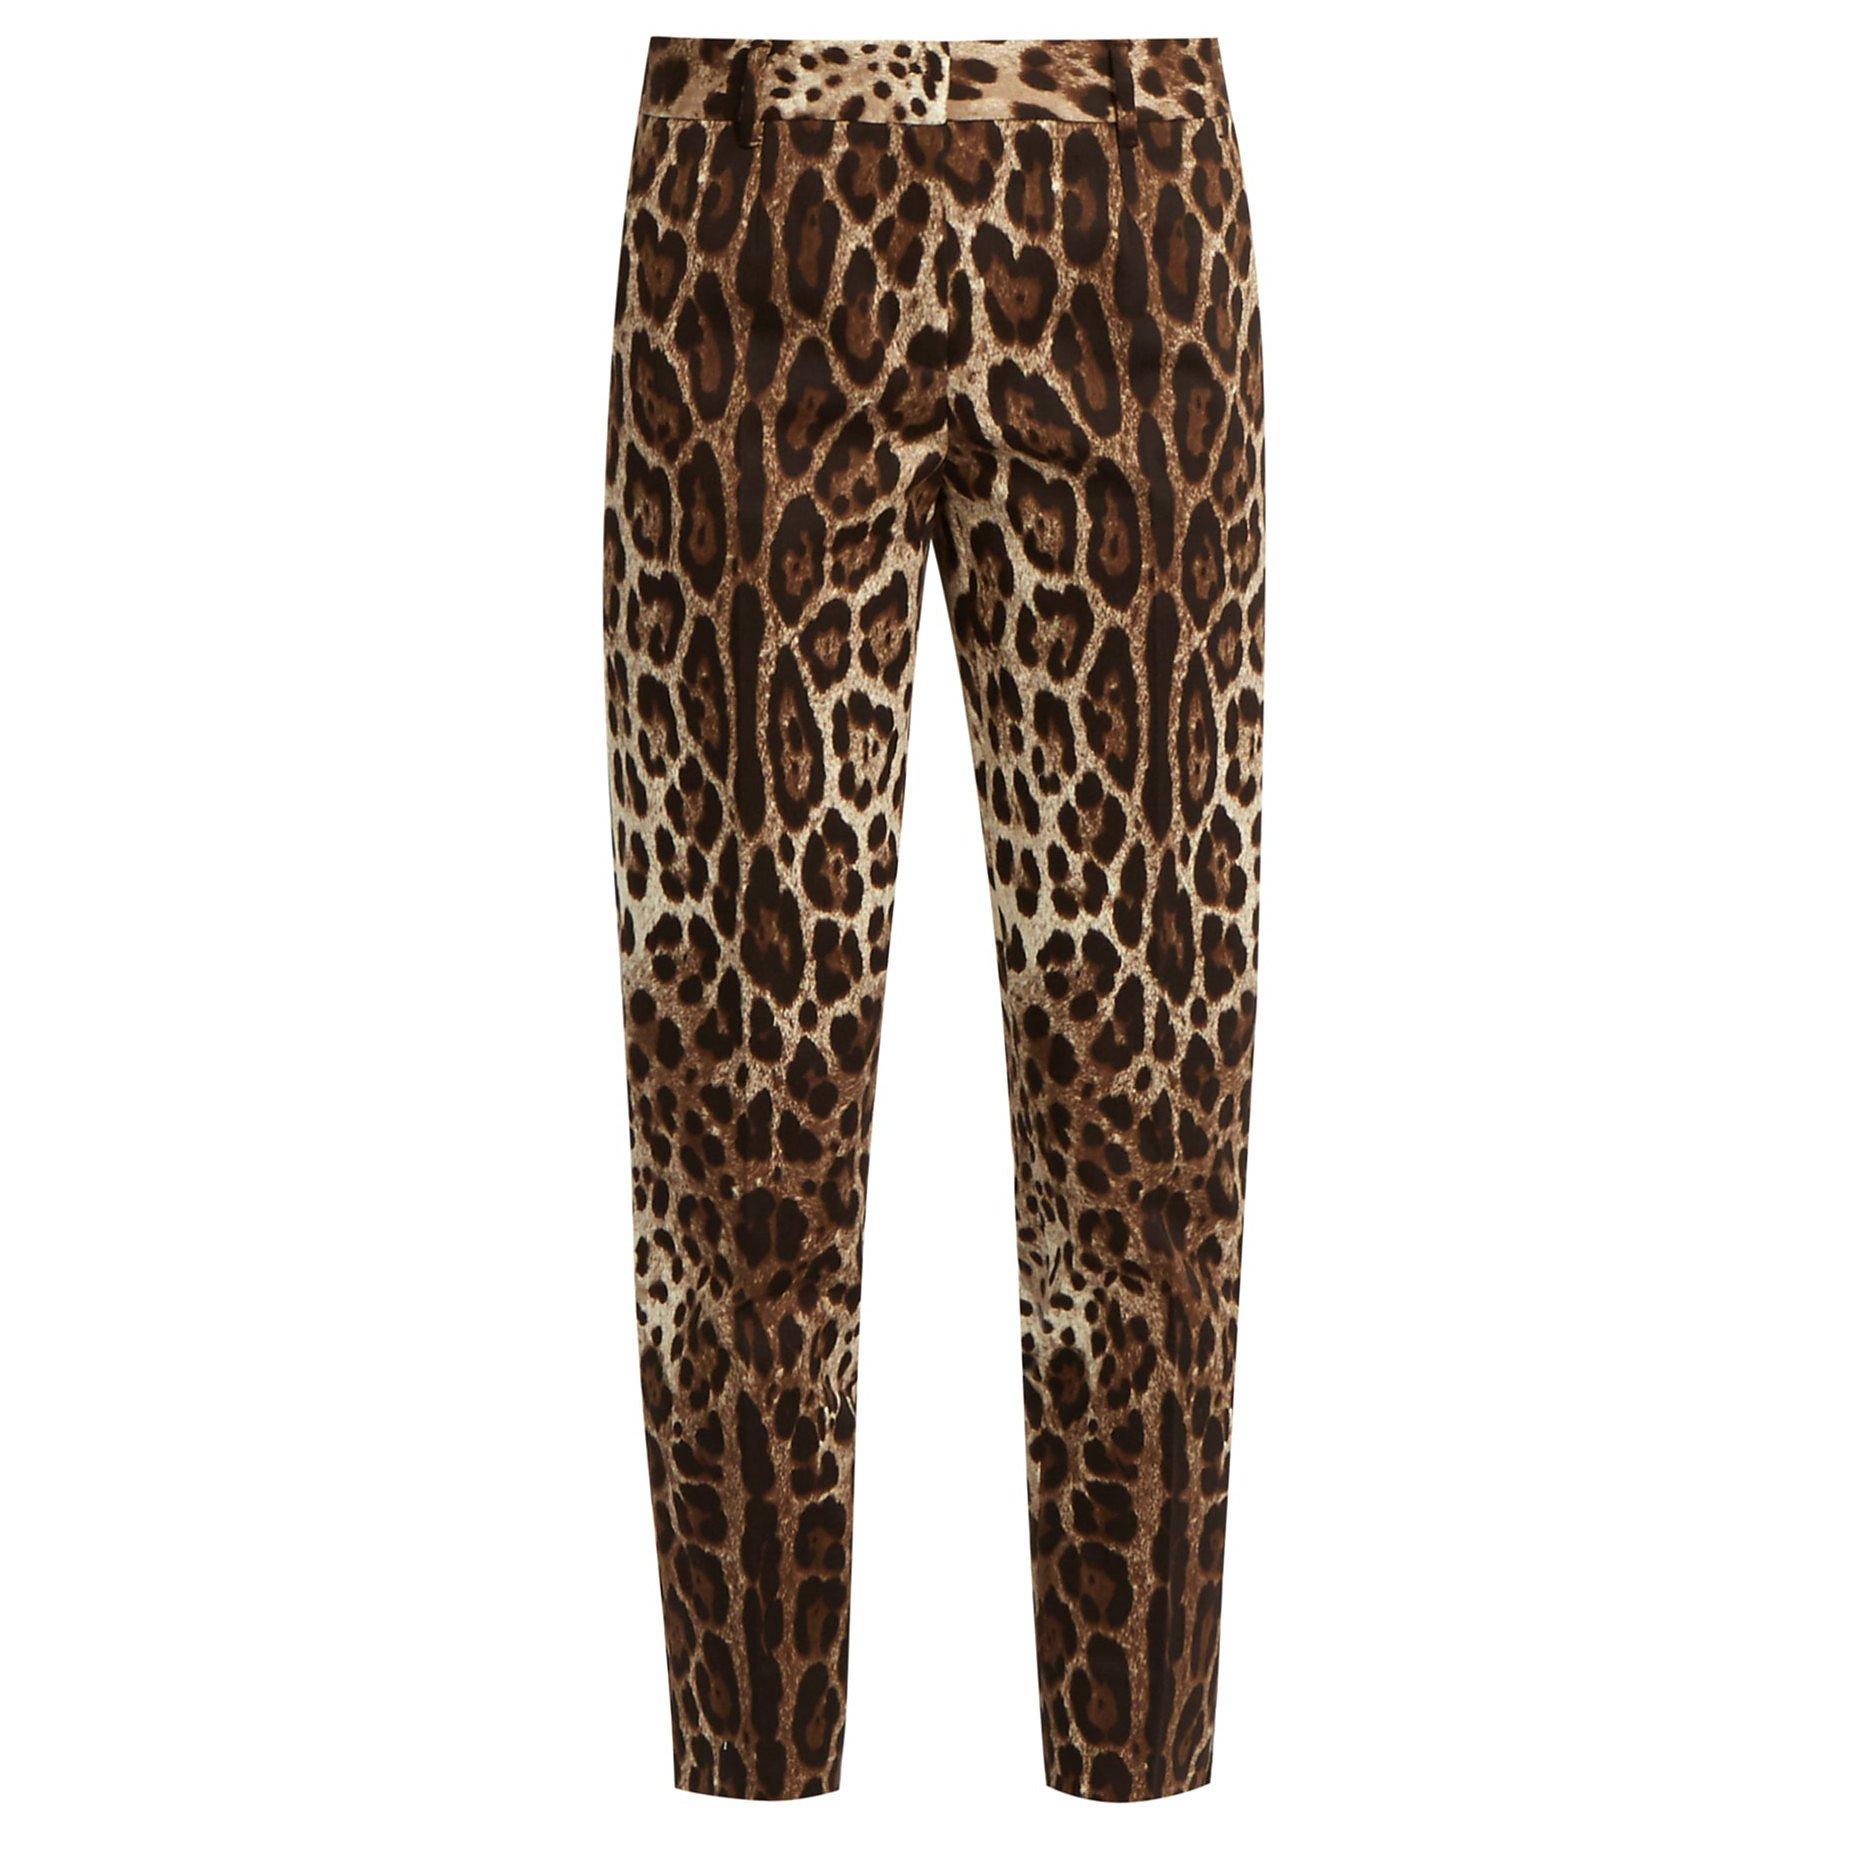 DOLCE & GABBANA Leopard Print Straight-Leg Trousers